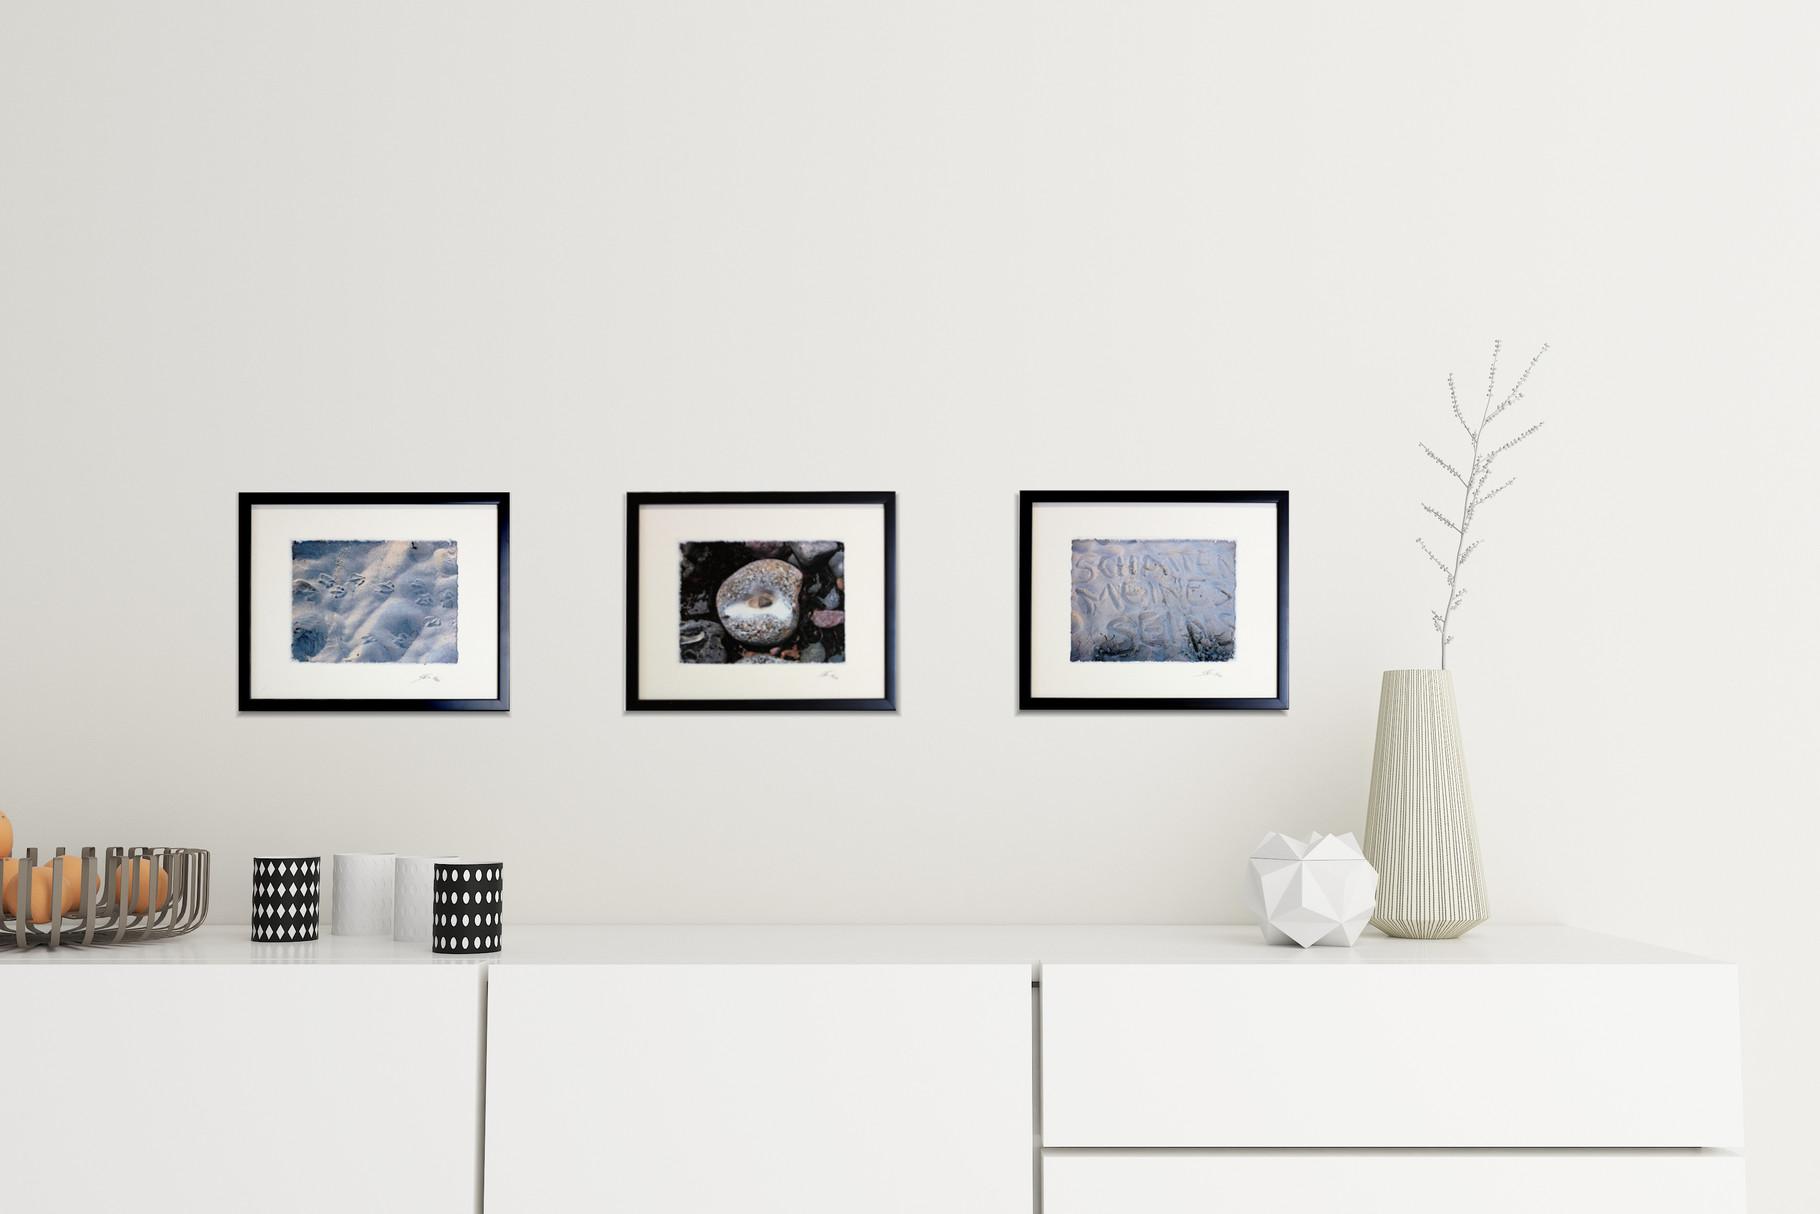 Artprint, Fotoarbeit